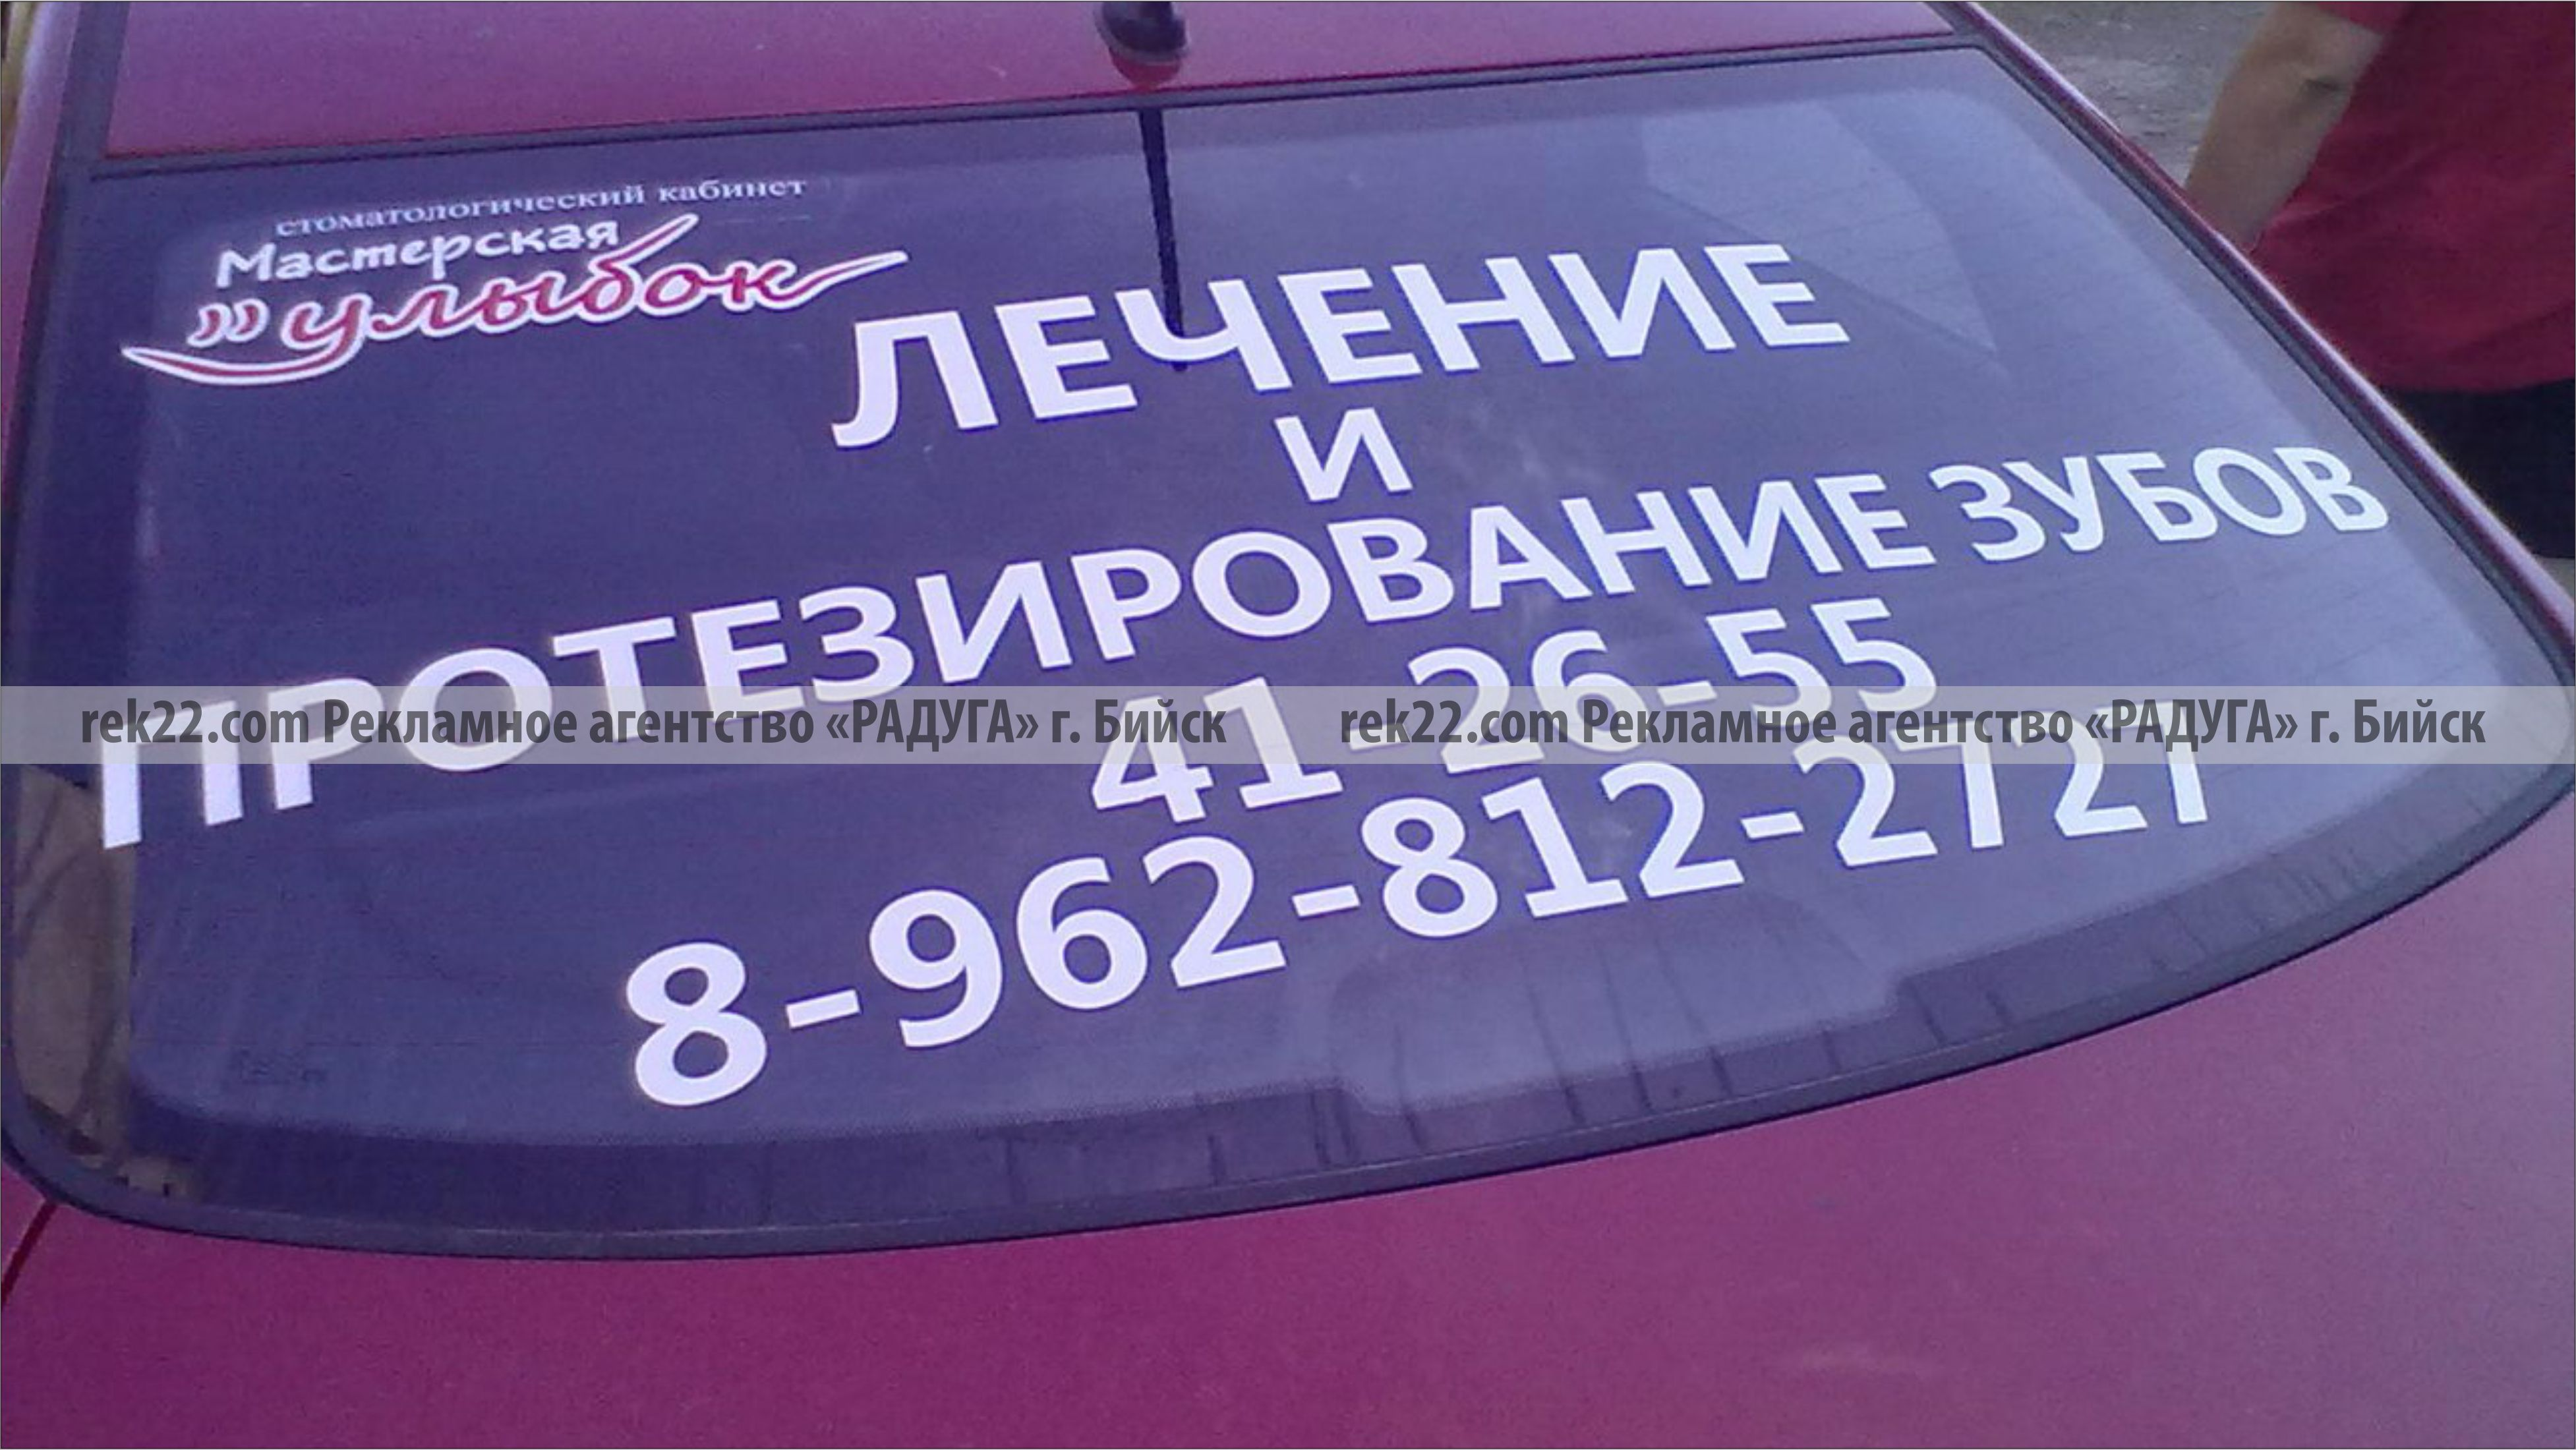 Реклама на транспорте Бийск - оклейка авто - 6